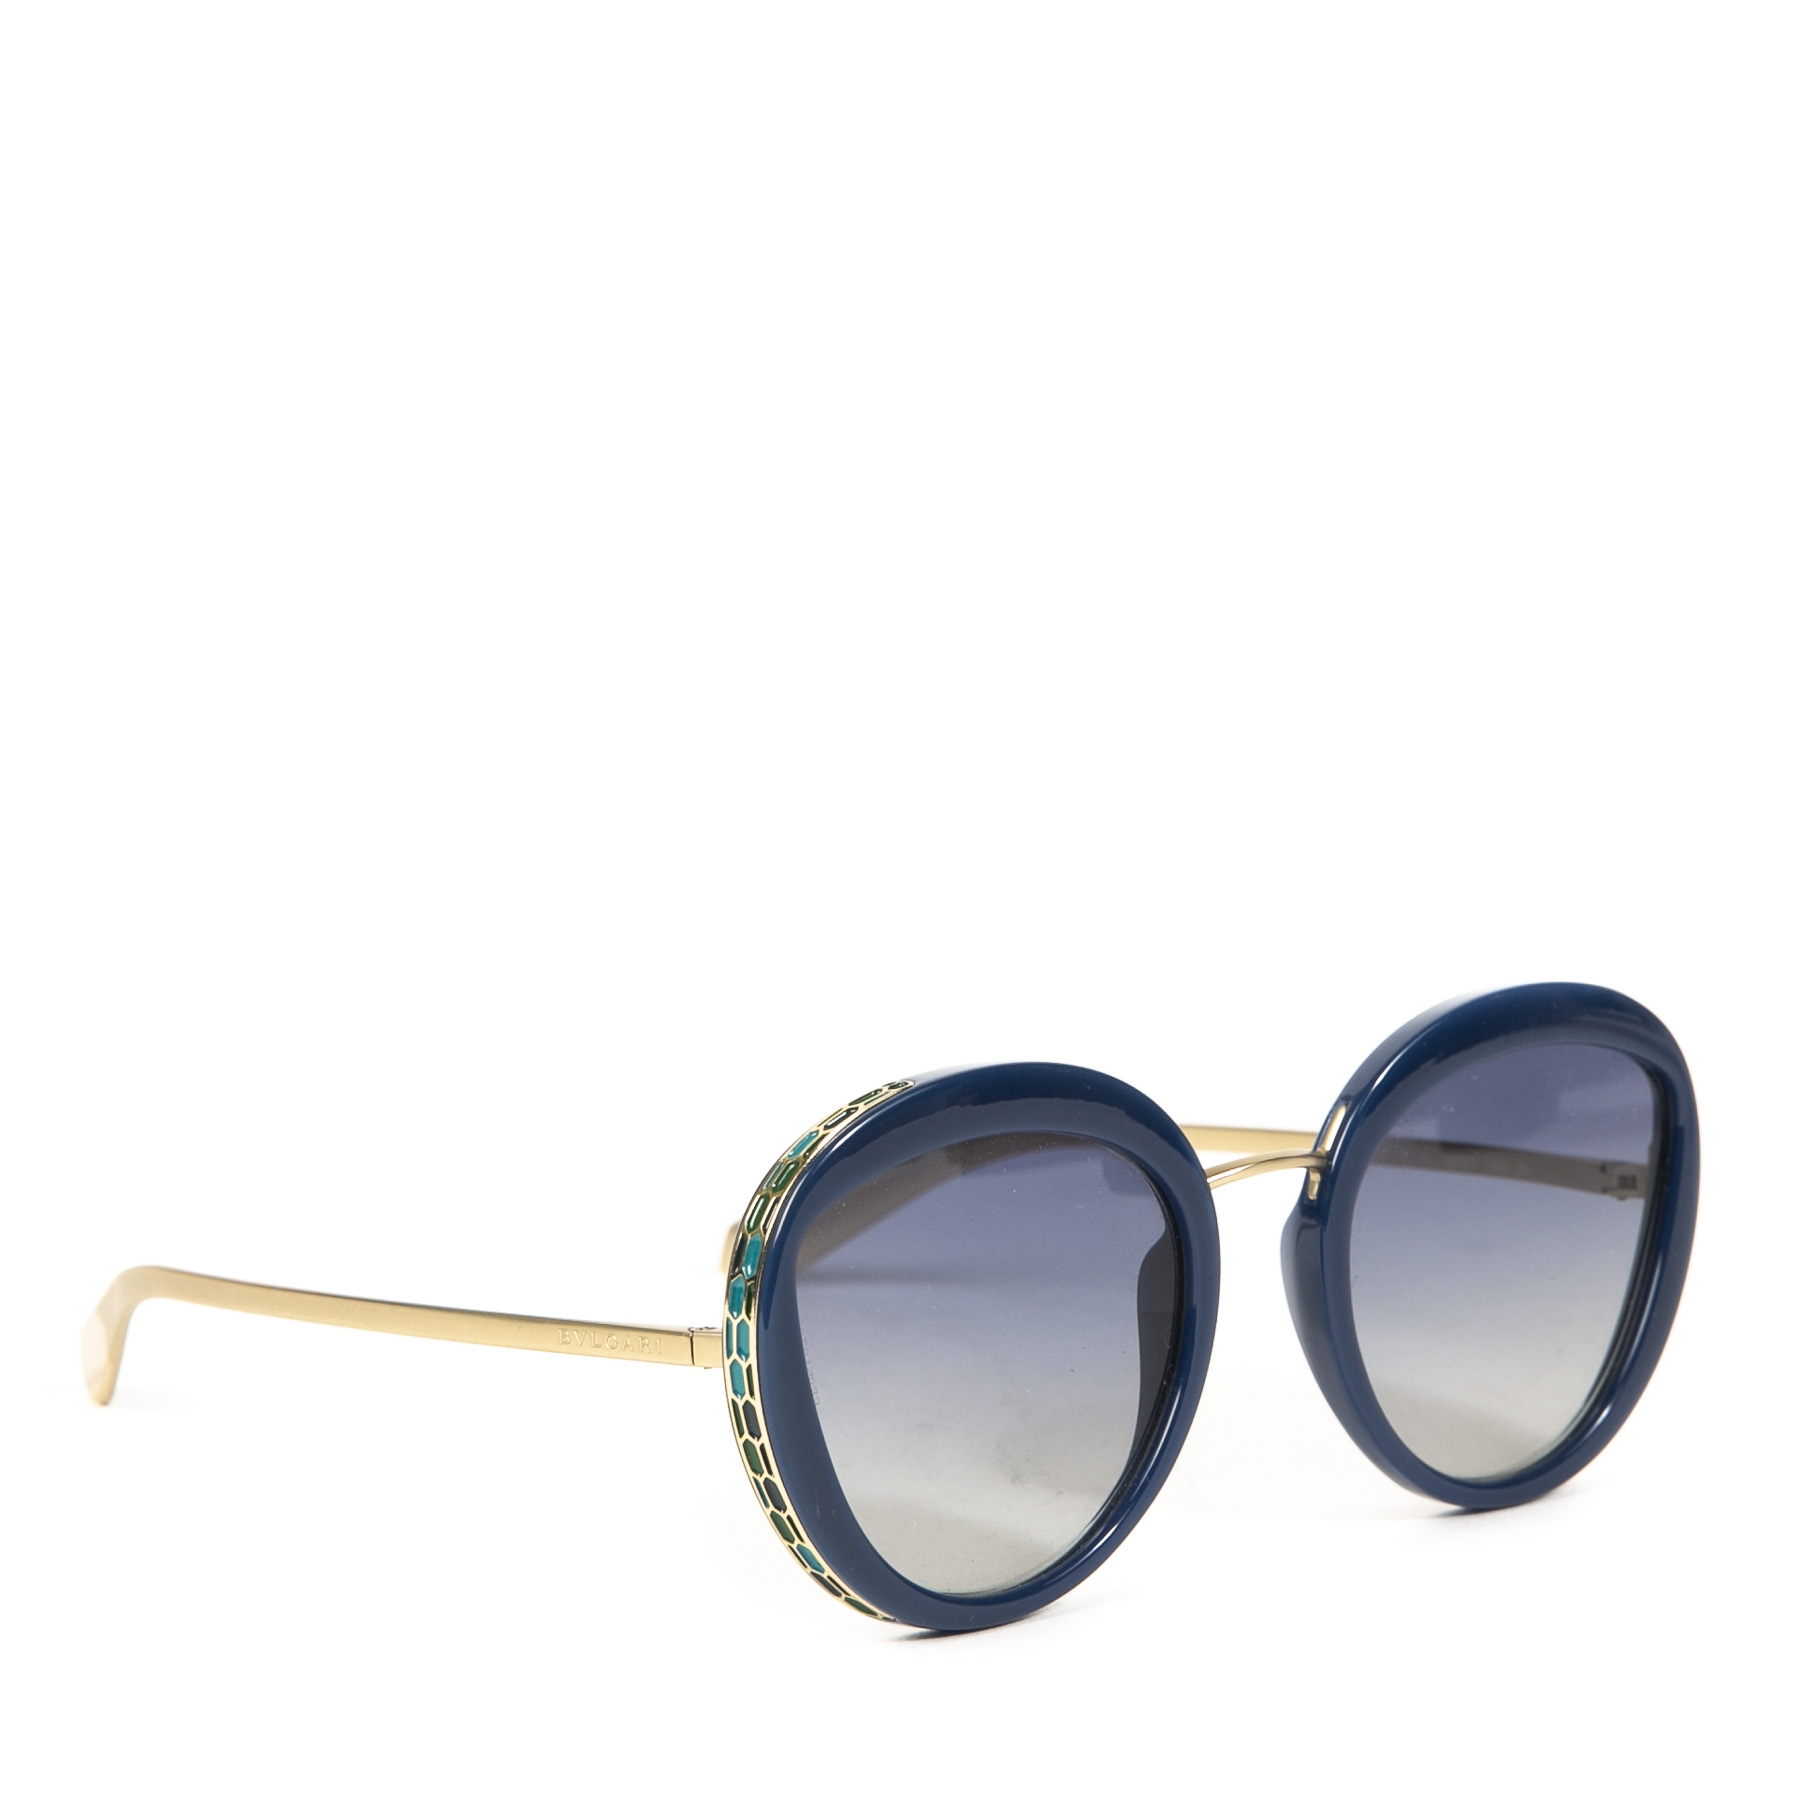 Bulgari Blue Round Sunglasses